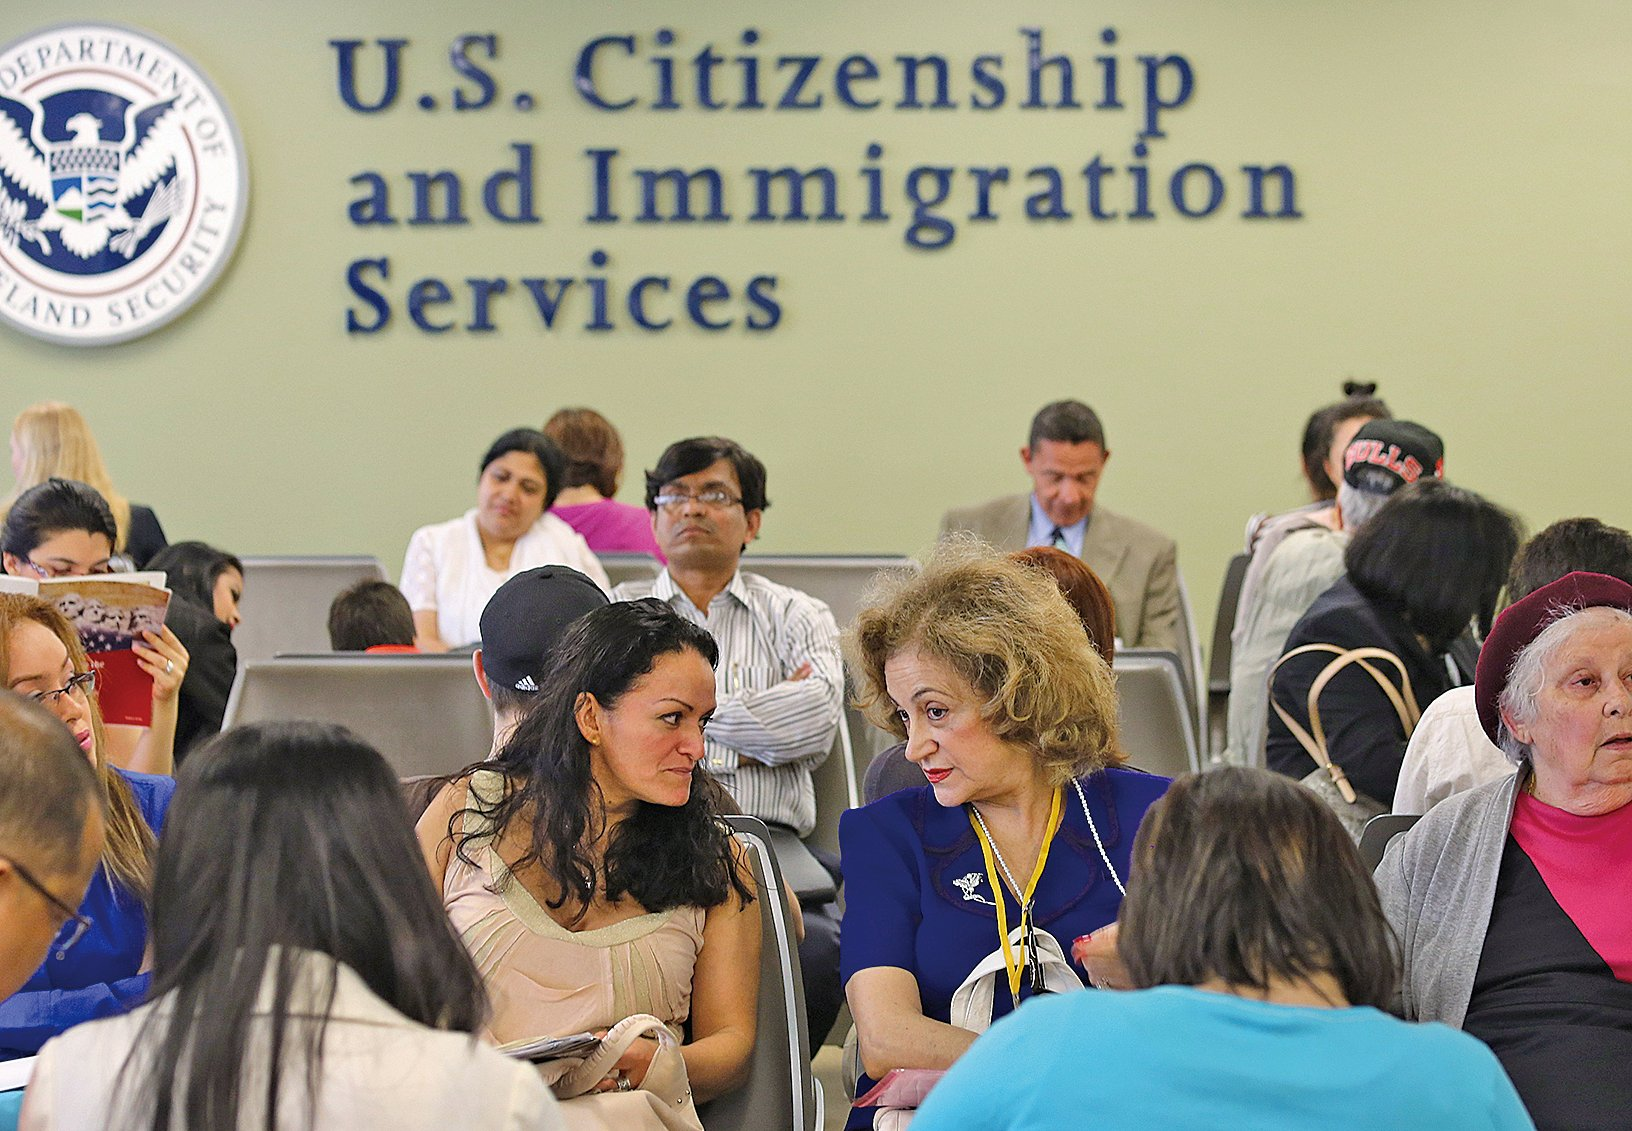 目前EB-5仍然是中國富人喜歡的移民方式。(John Moore/Getty Images)